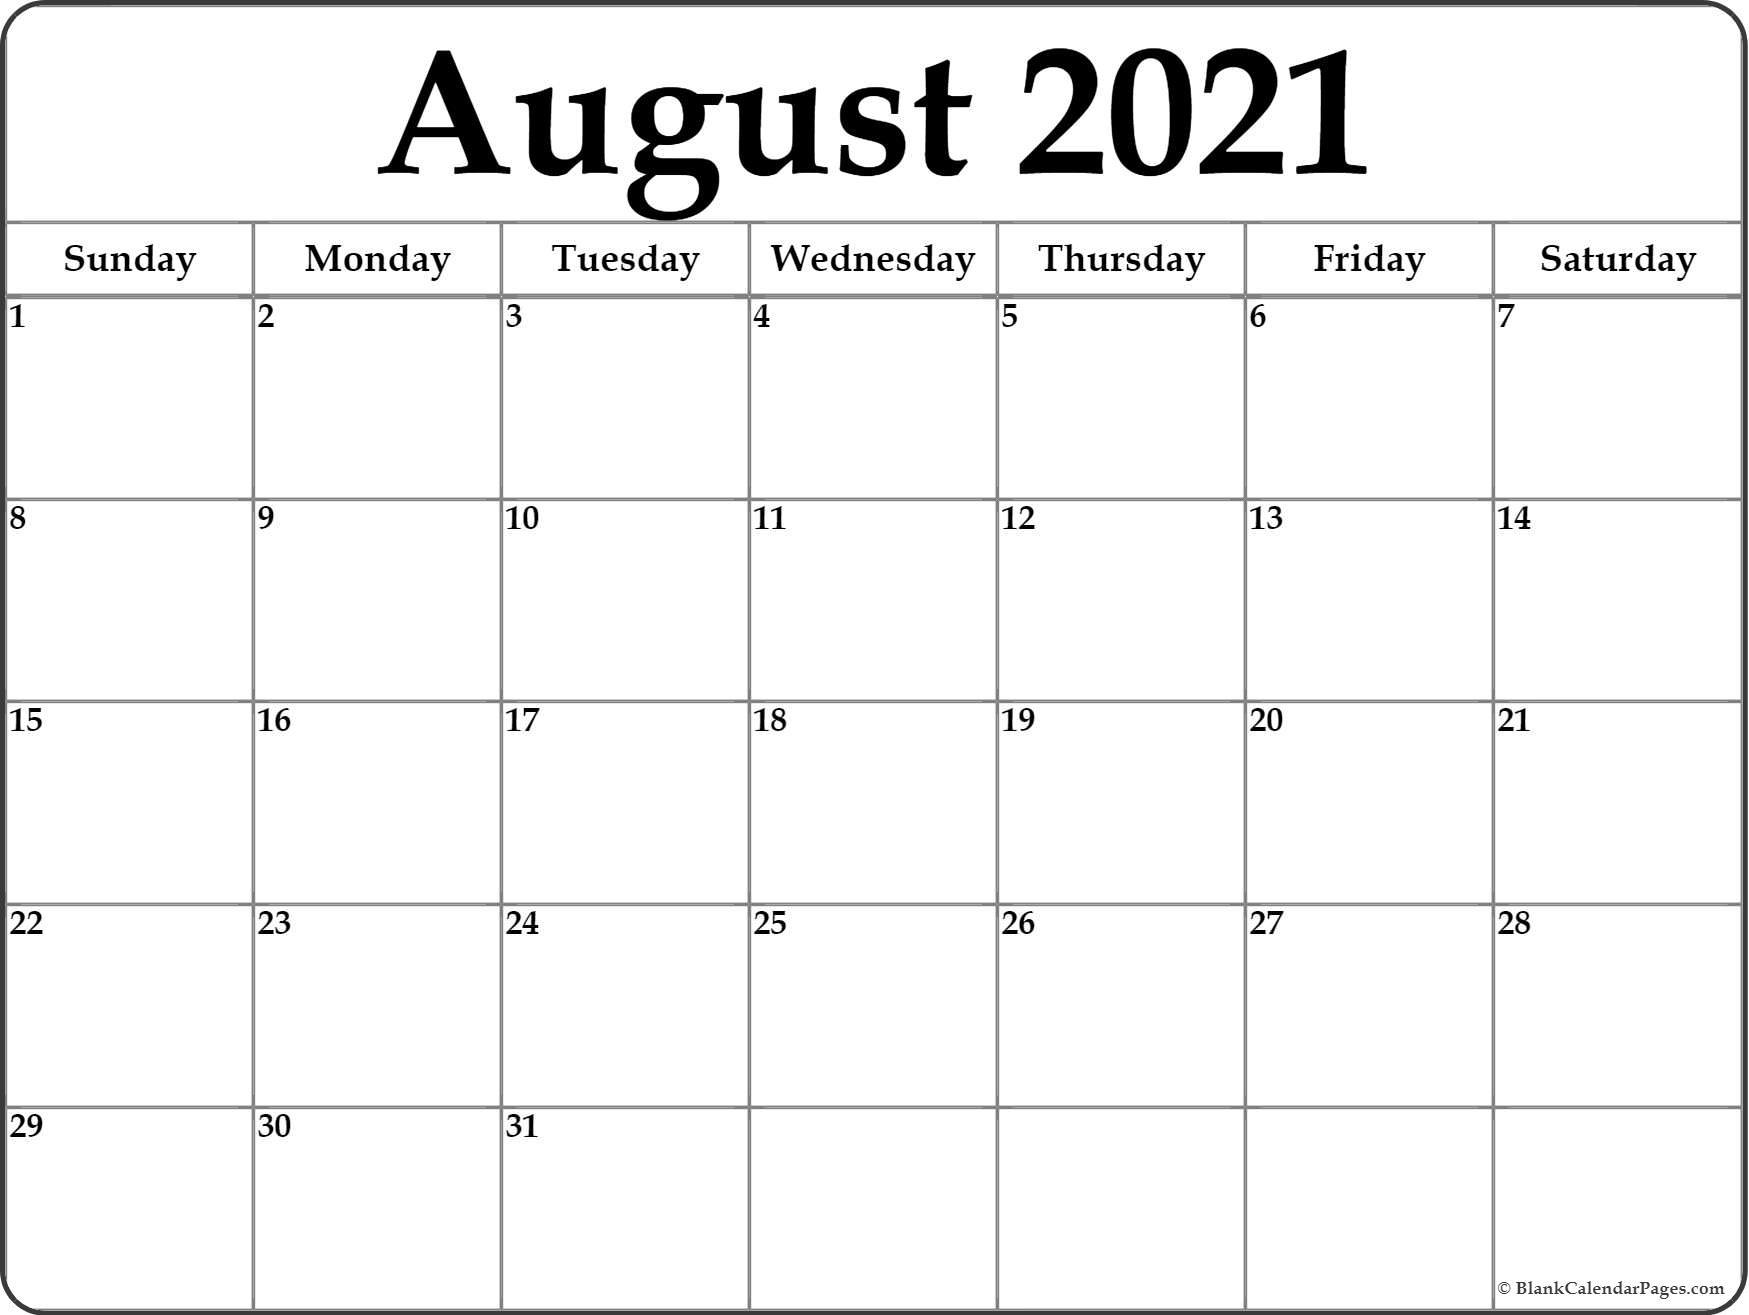 August 2021 Calendar | Free Printable Calendar August 2021 Template Calendar